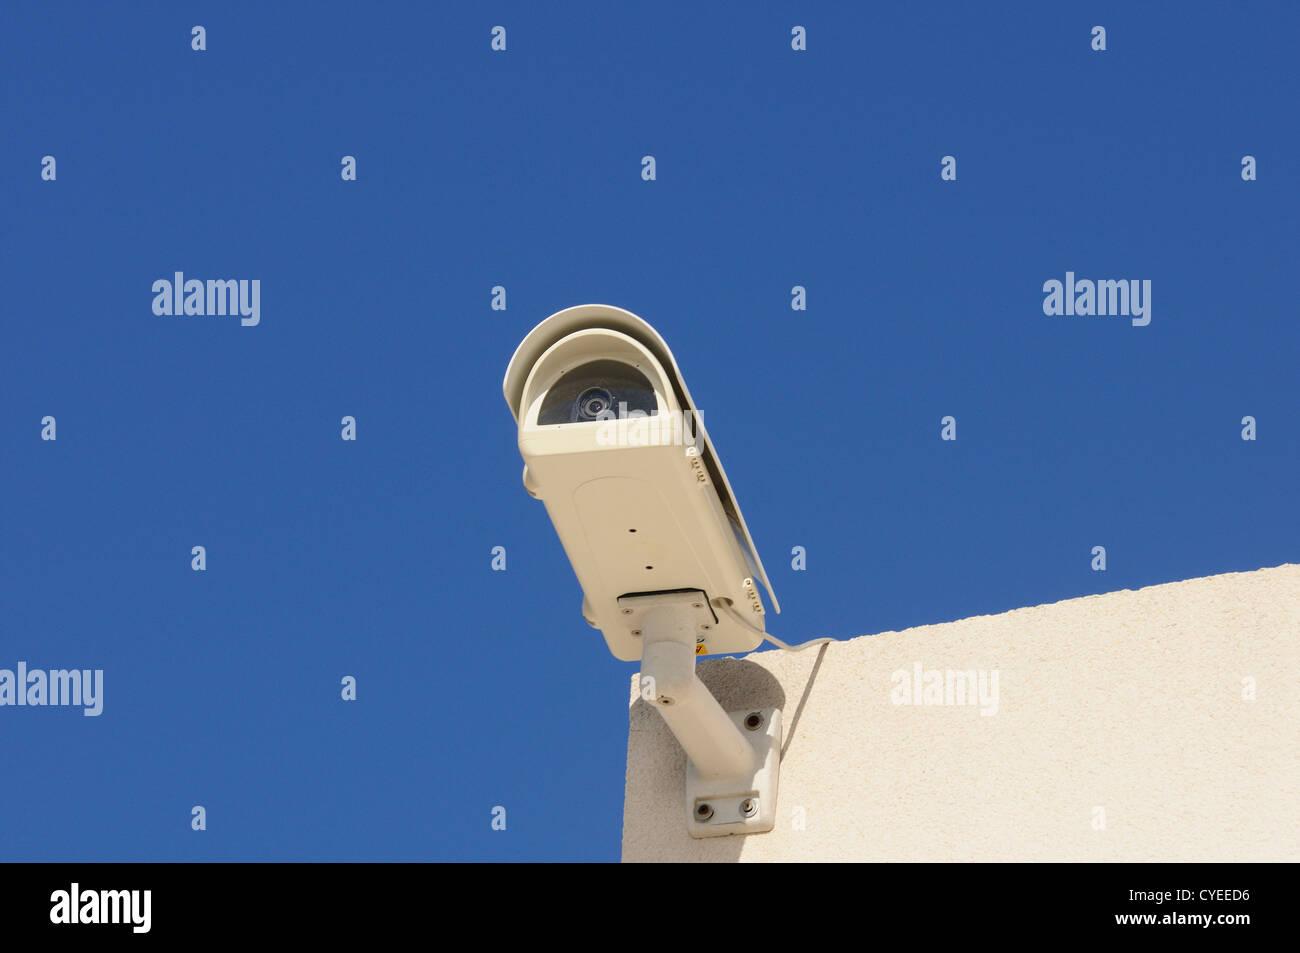 Security concept, selective focus on nearest - Stock Image